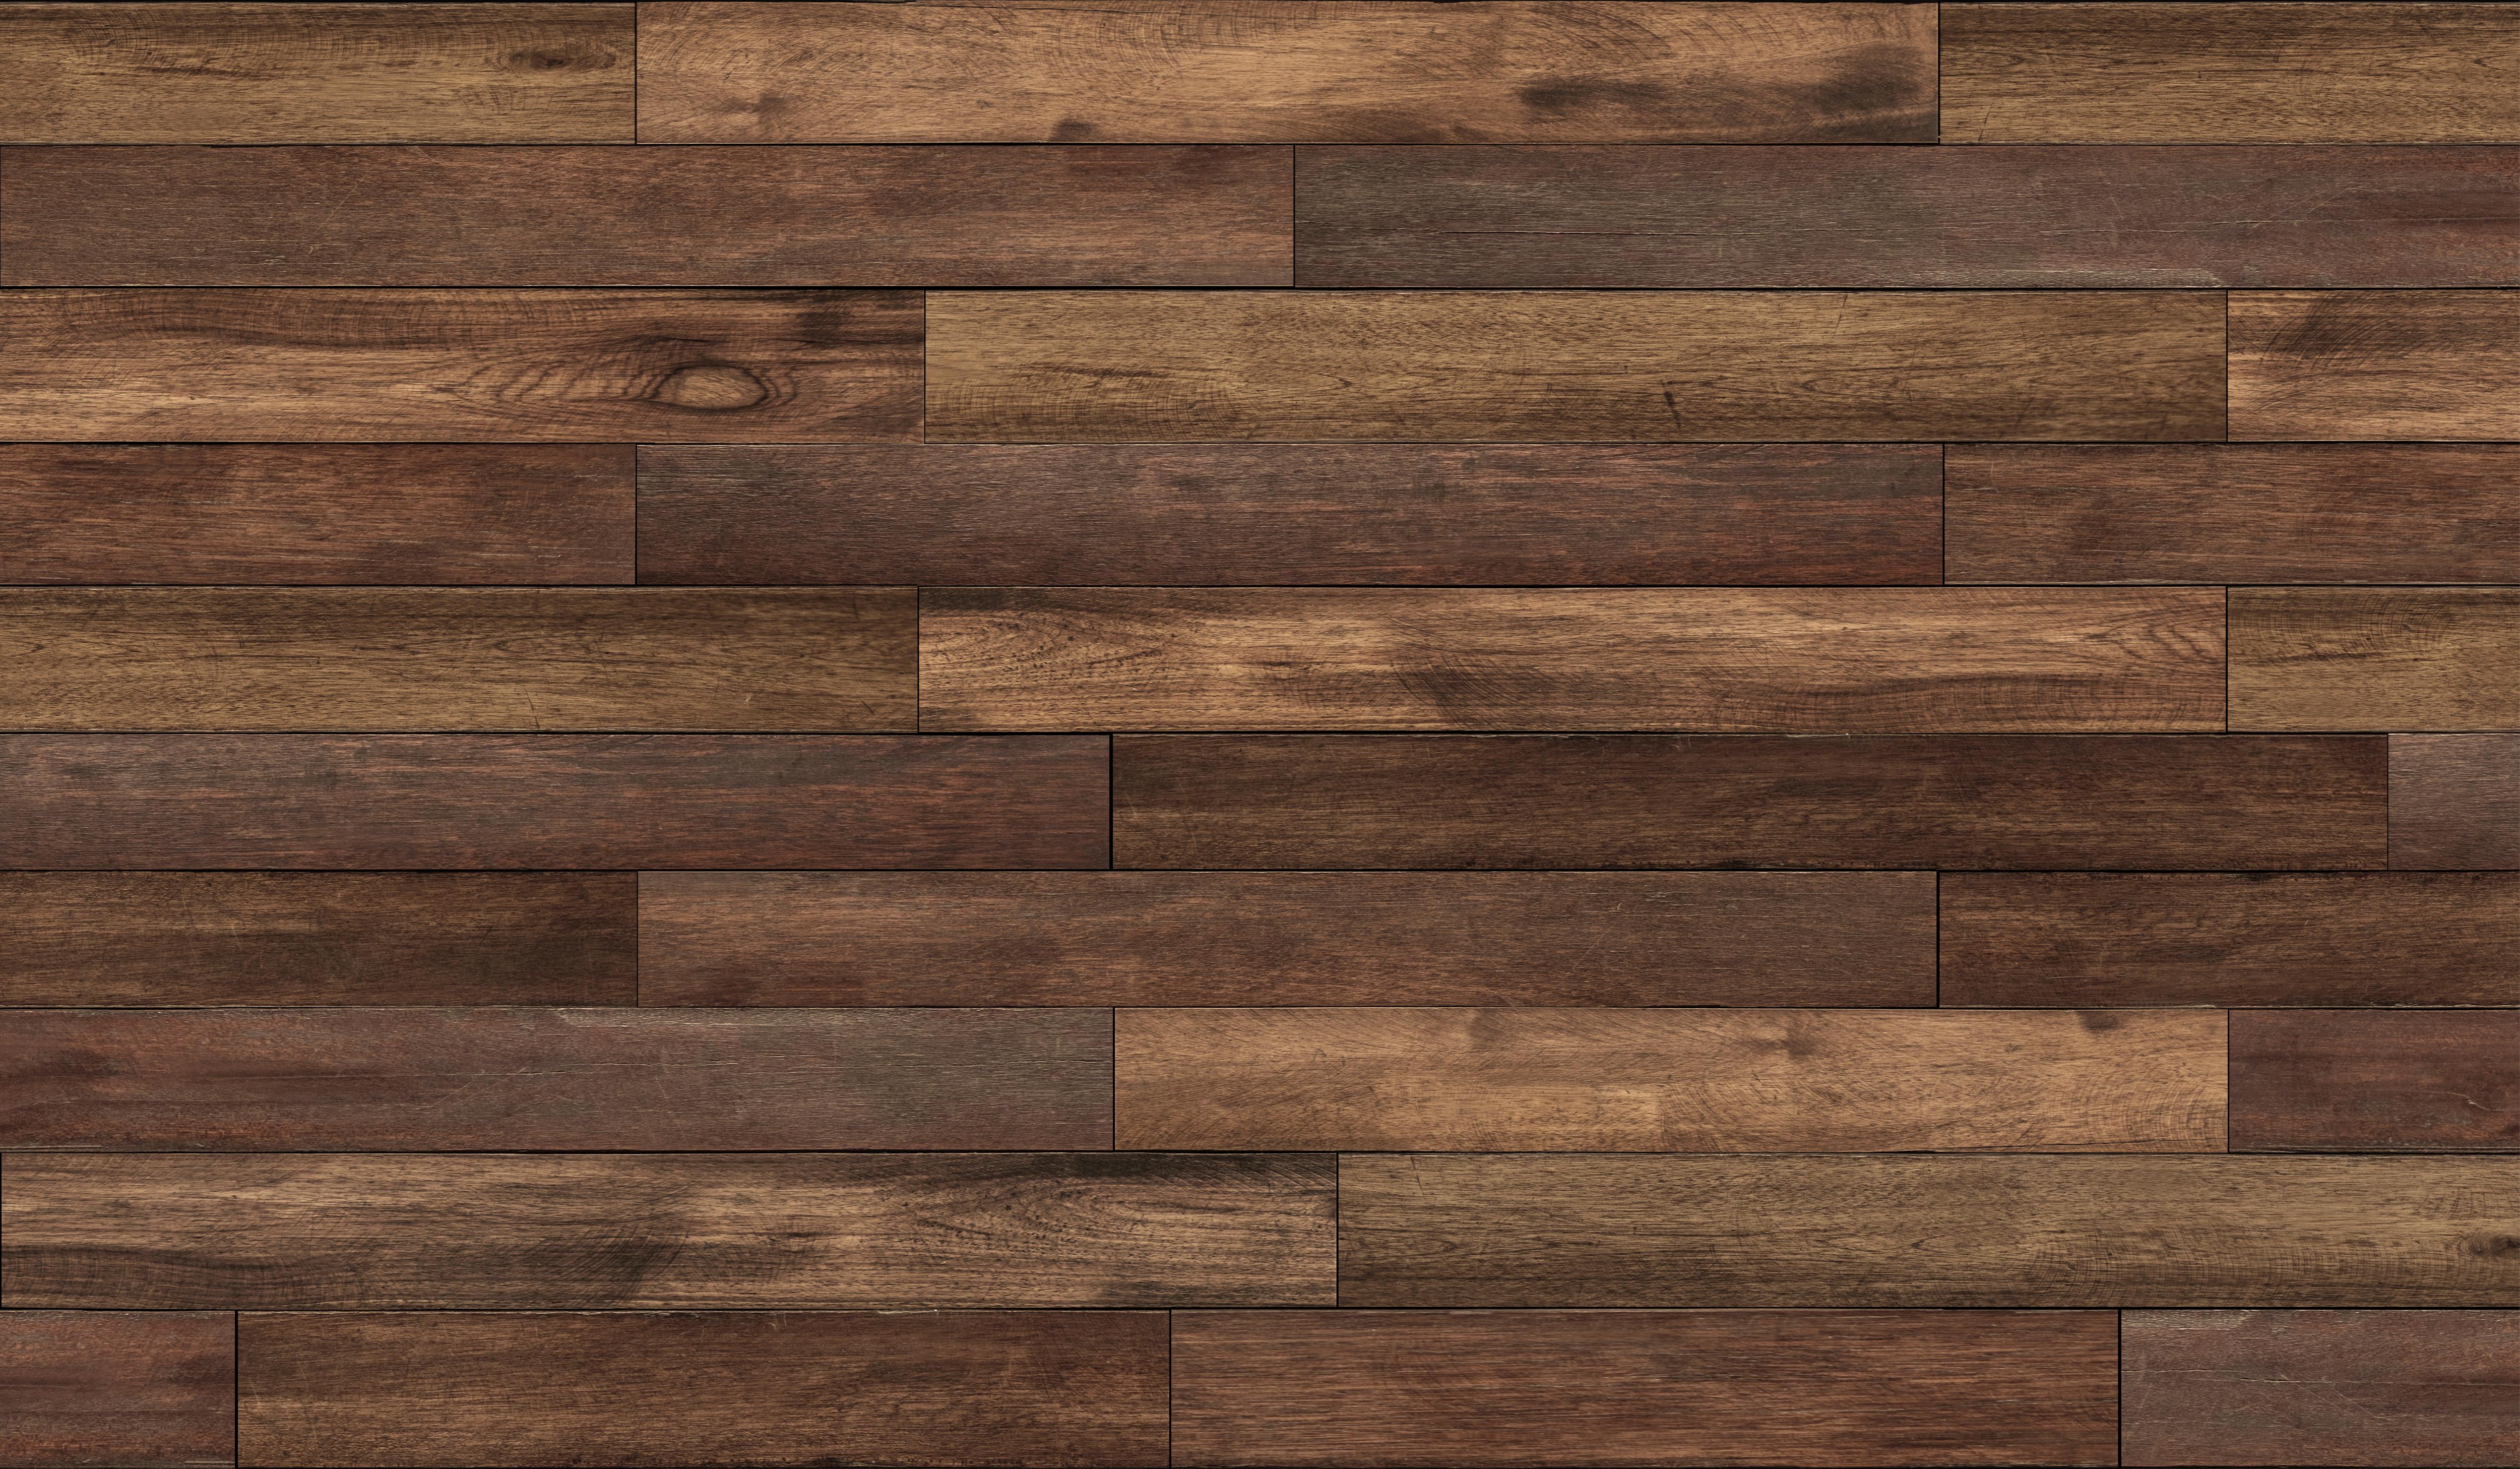 Seamless wood floor texture, hardwood floor texture - Bay ...